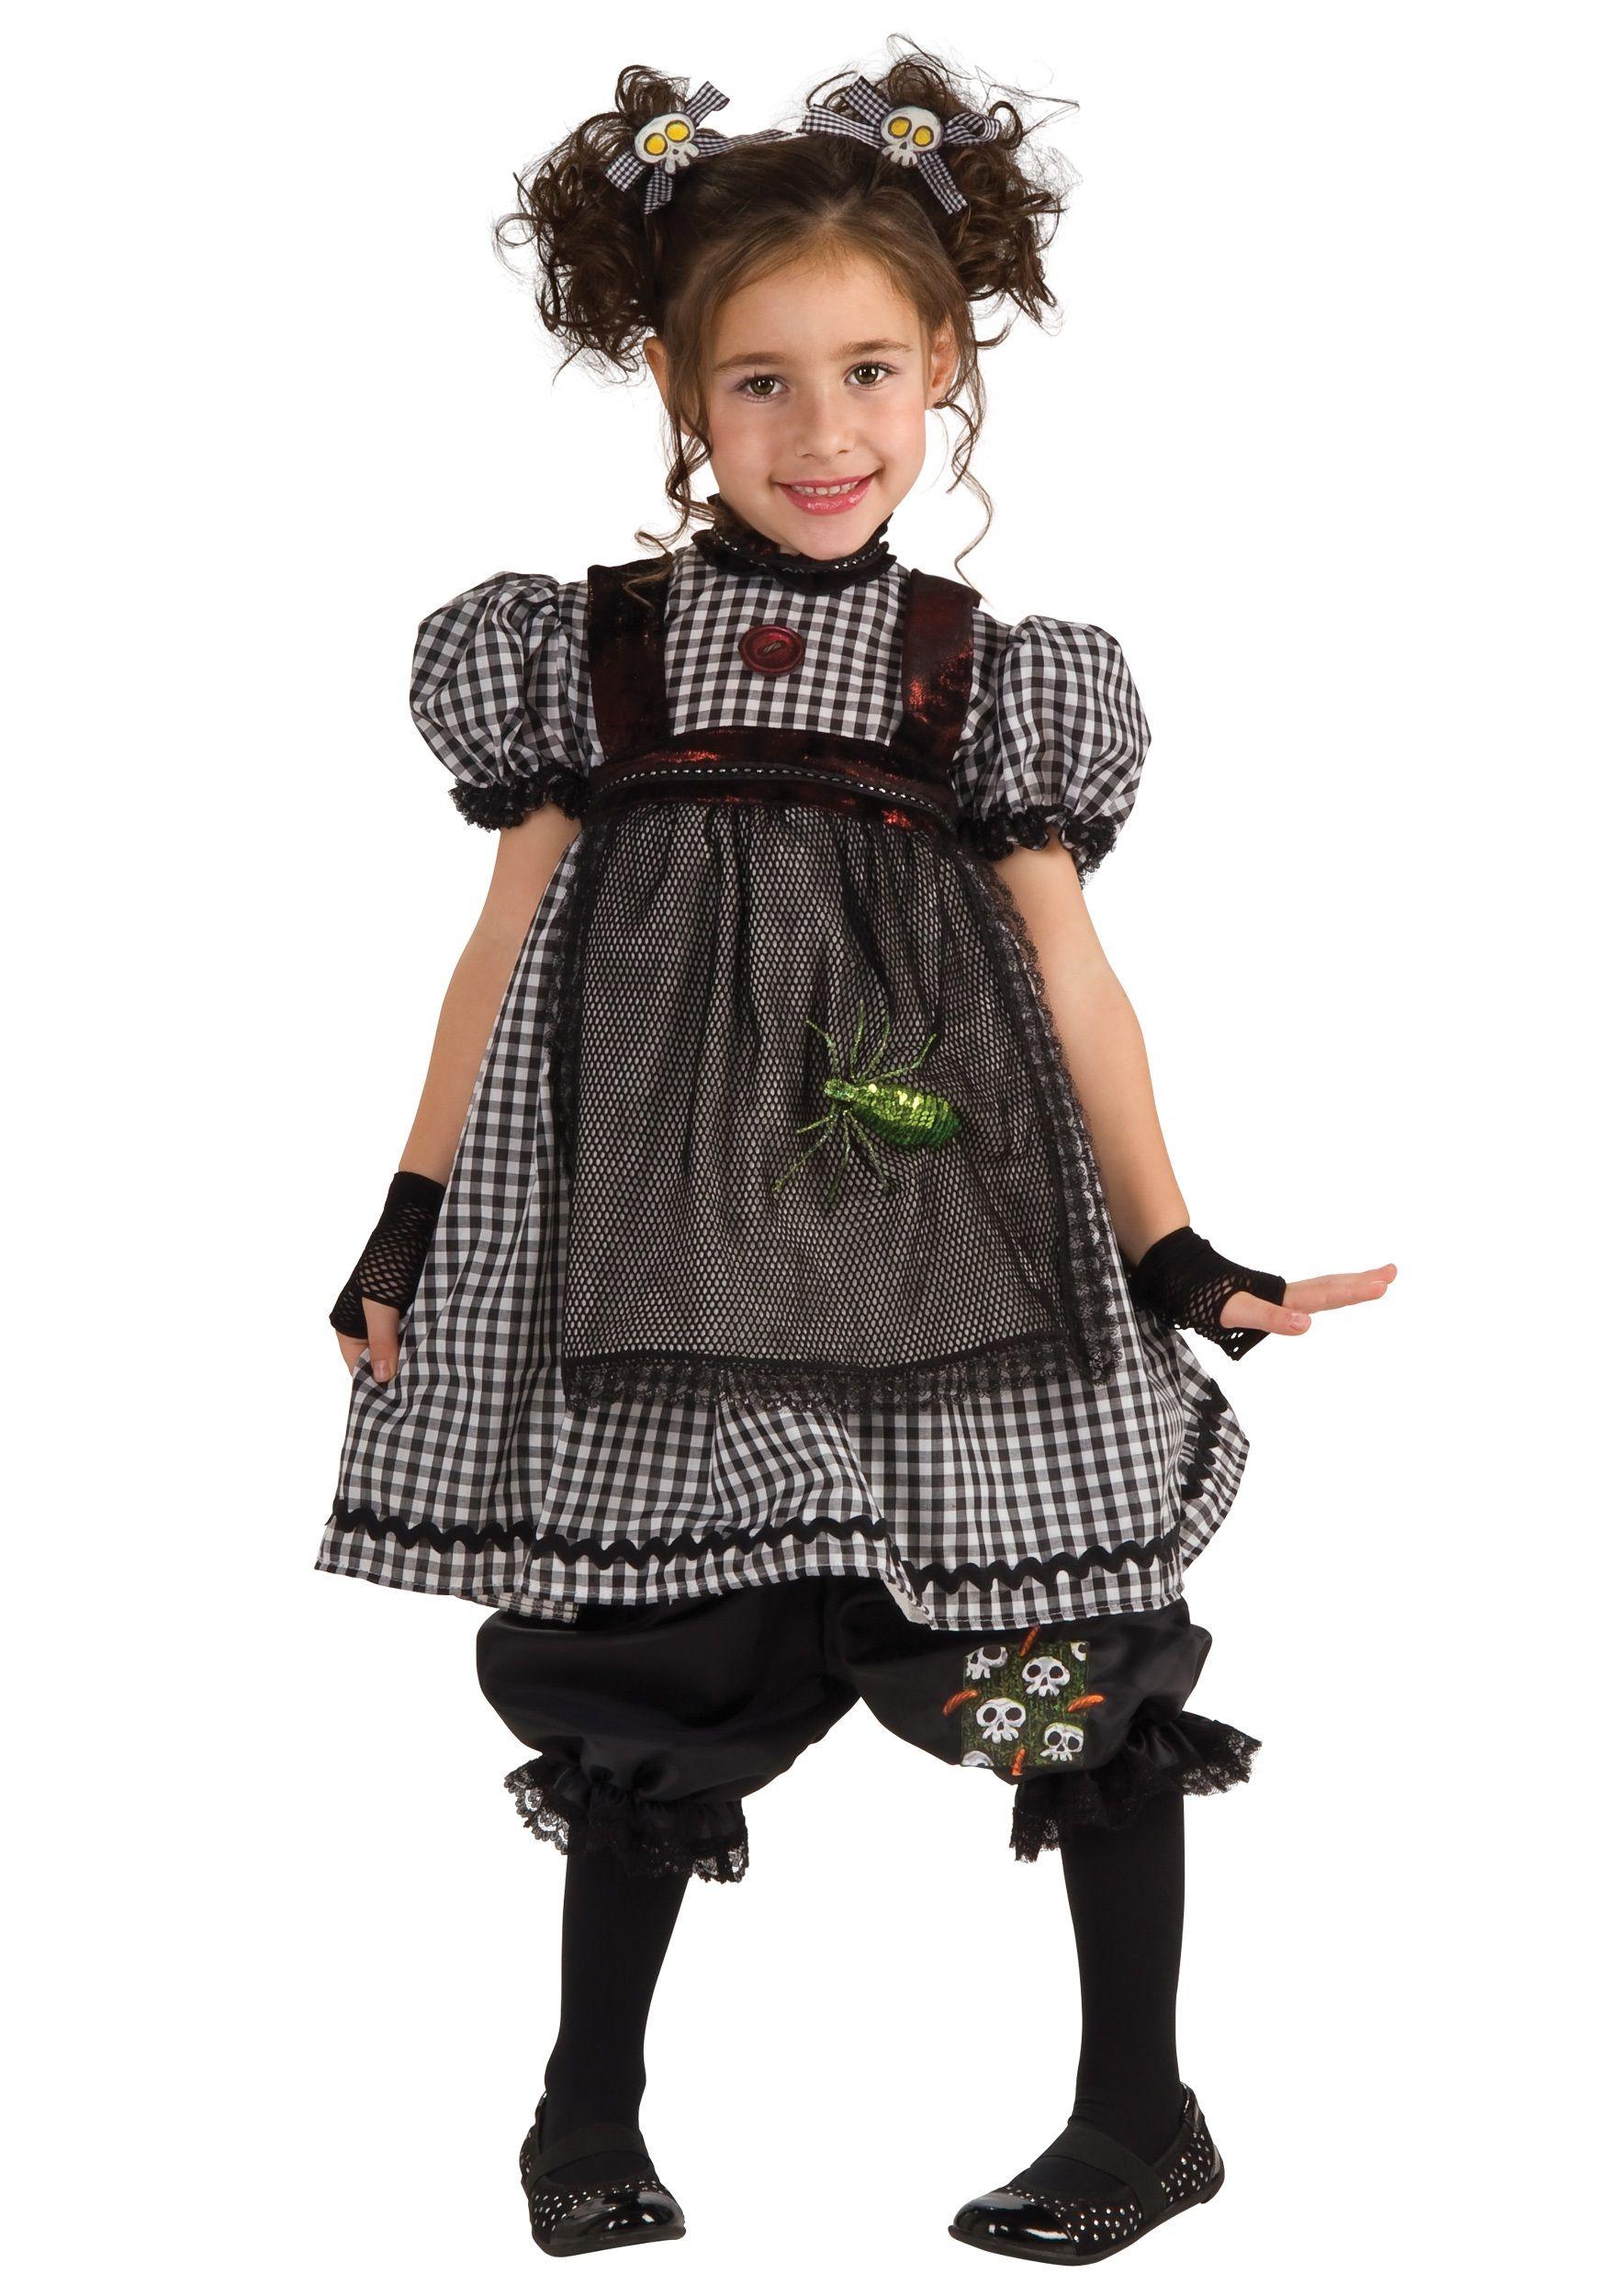 3474b0ce6030 Child Gothic flower girl dress 100% polyester Black and white ...